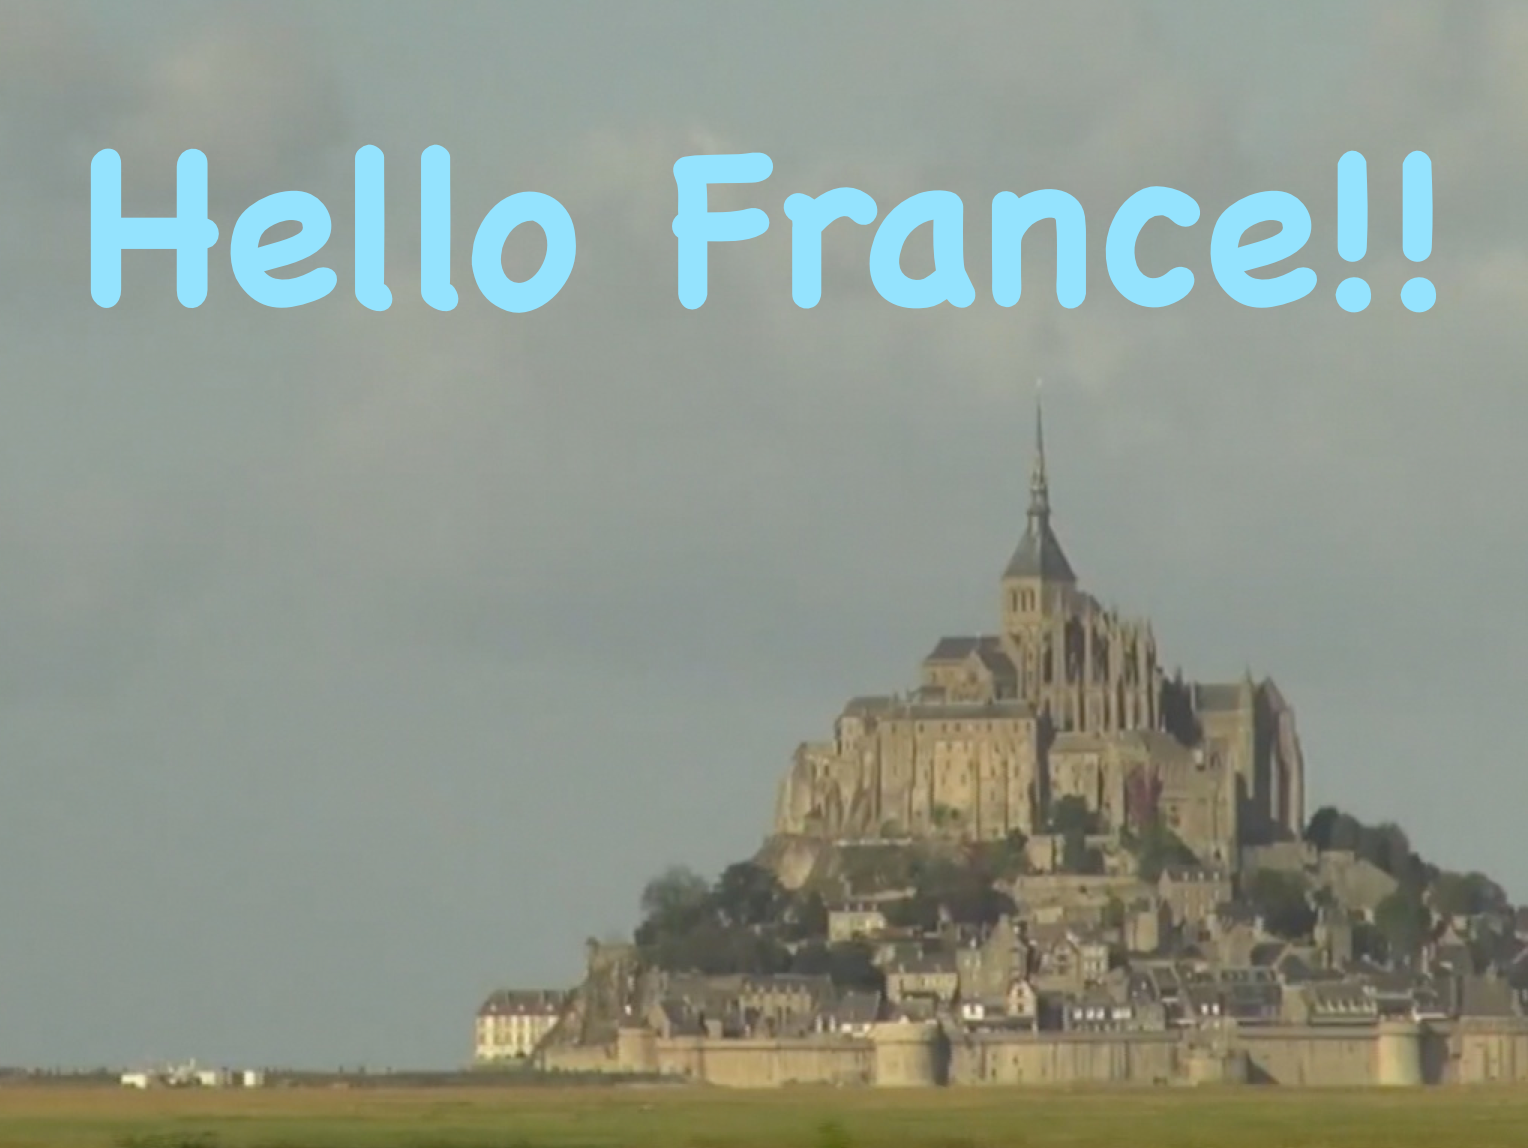 Hello France!!(モンサンミッシェル)